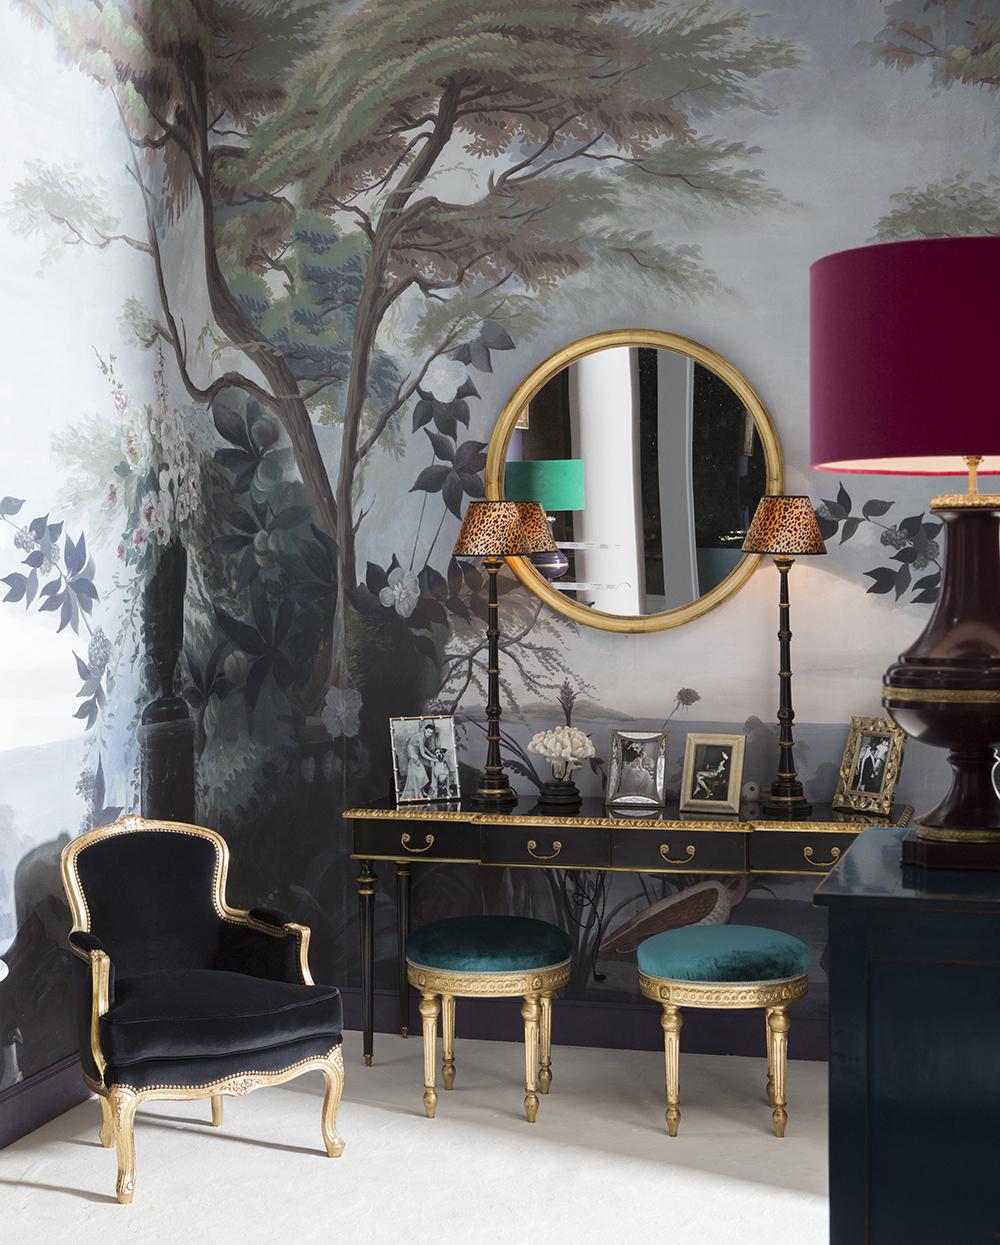 maison objet le jardin au flamant rose ananb le blog. Black Bedroom Furniture Sets. Home Design Ideas